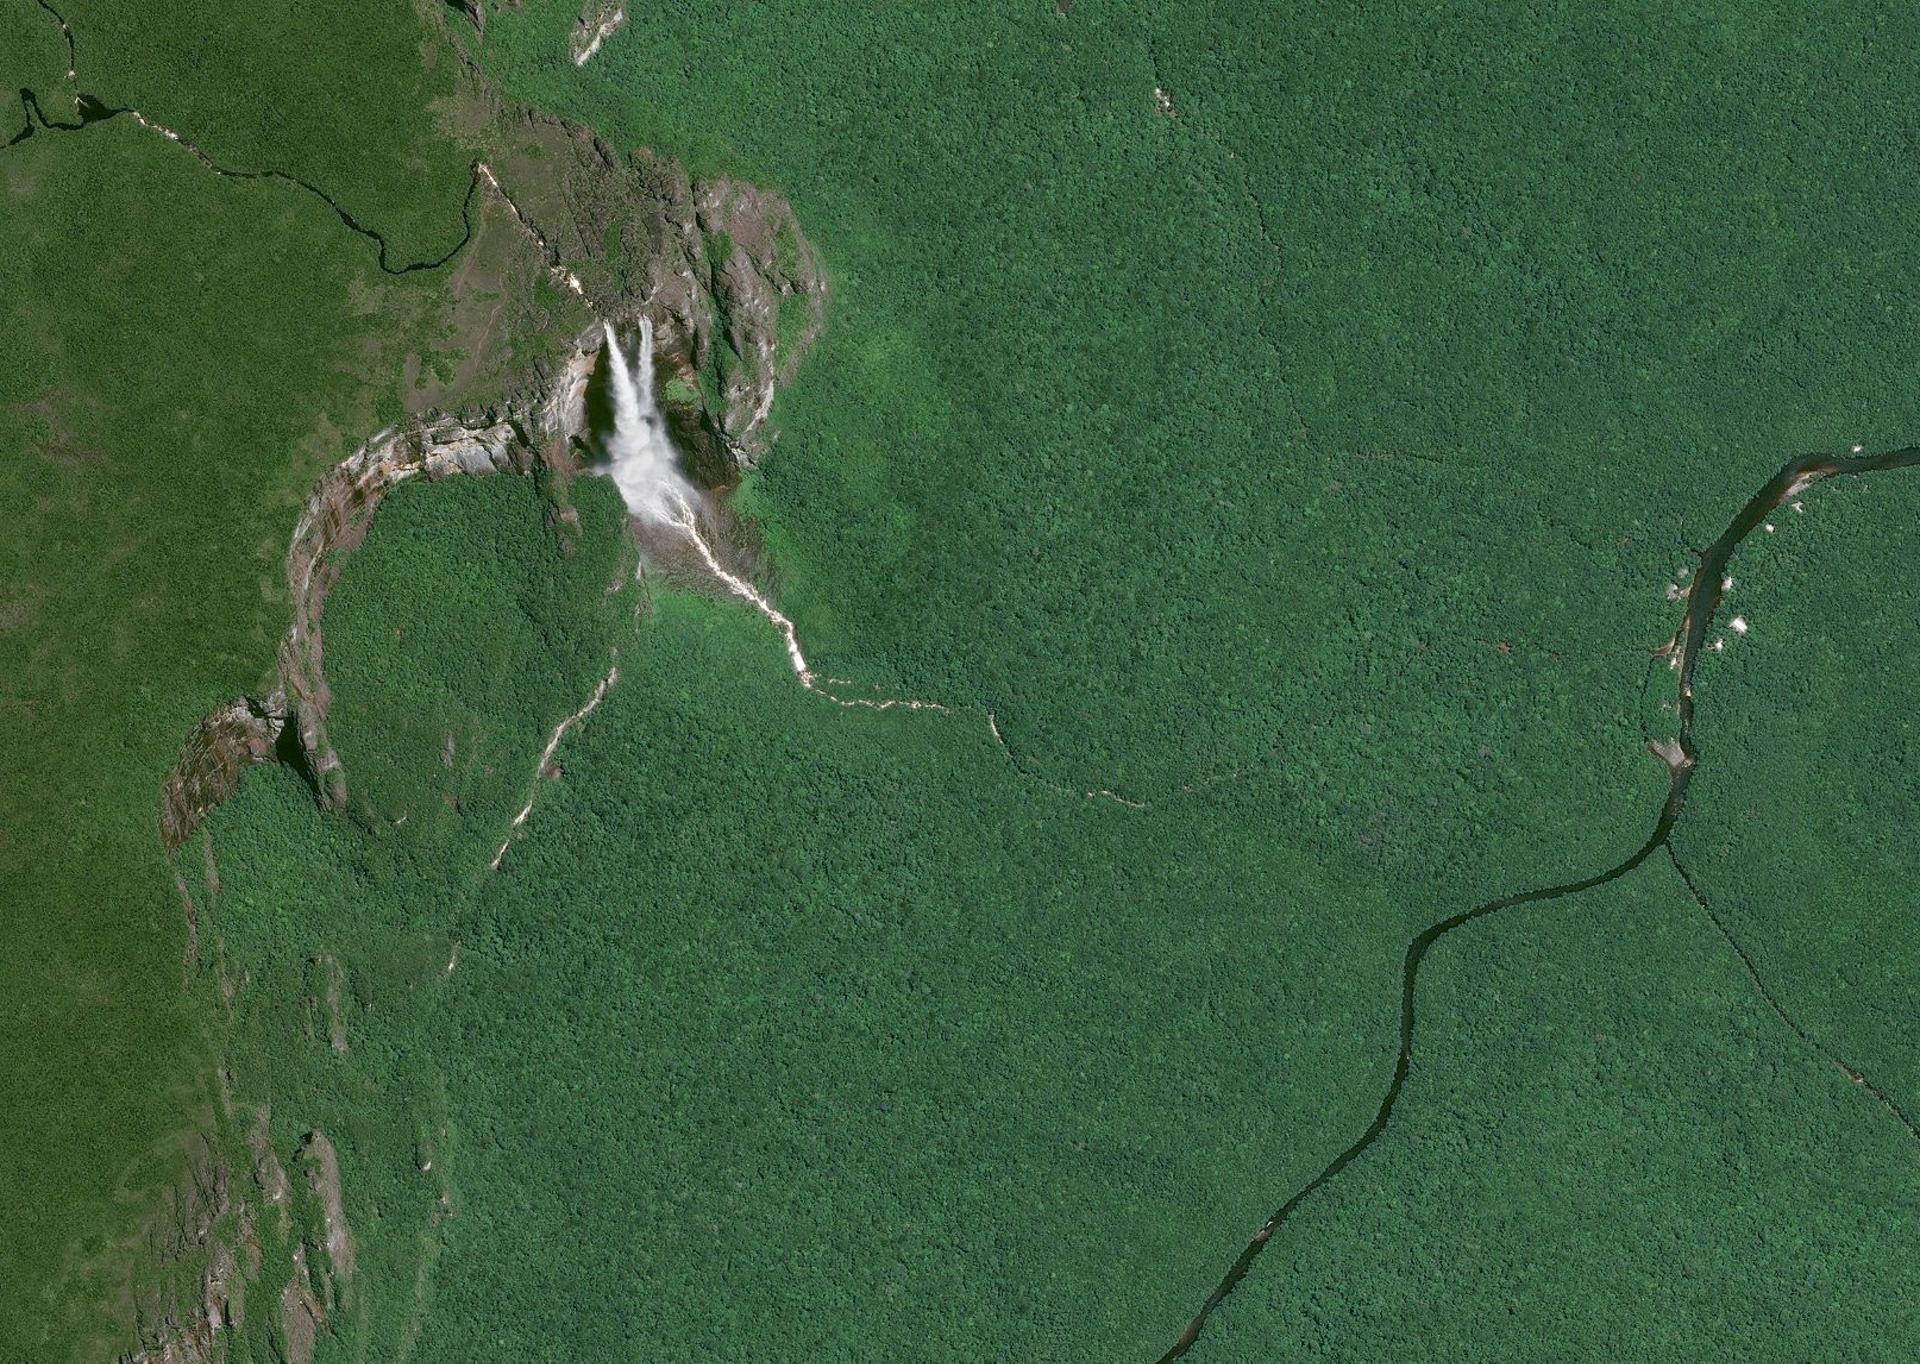 Angel Falls in Venezuela, a Pléiades satellite image.